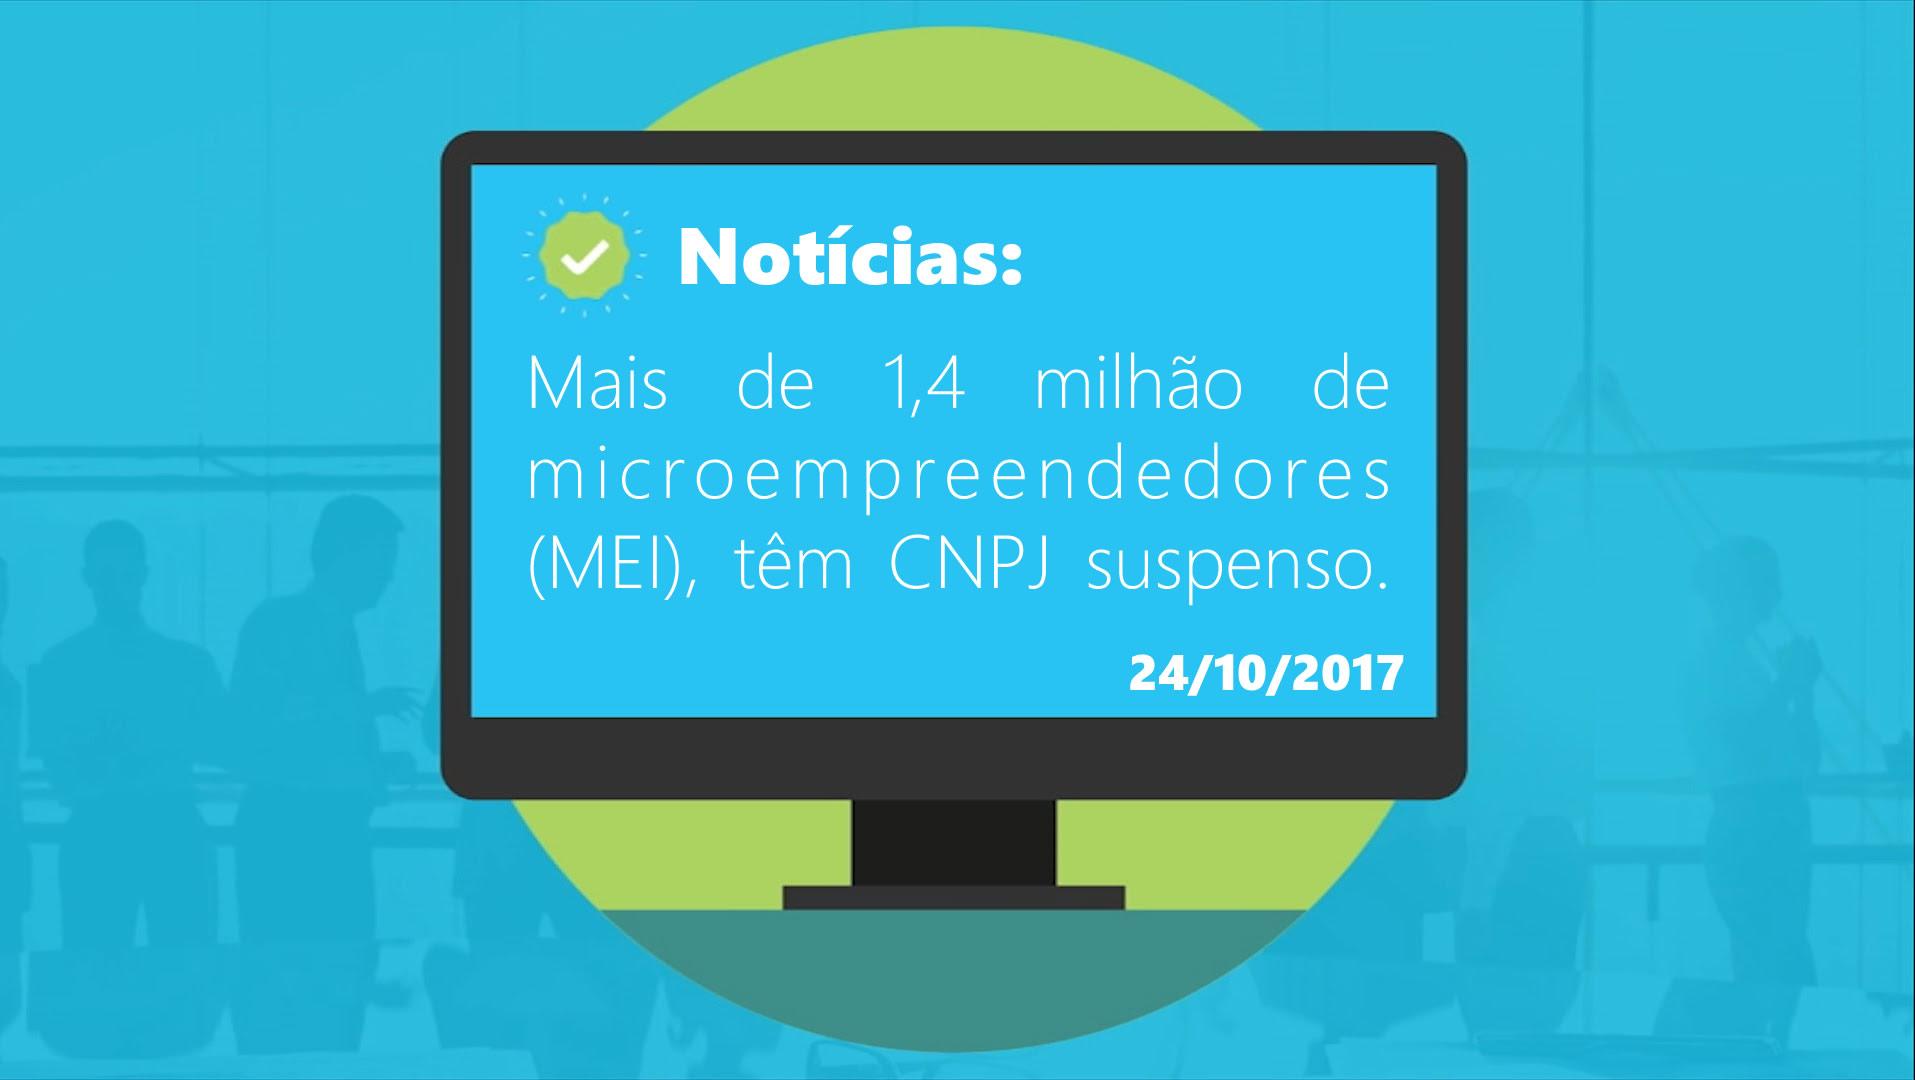 Mais de 1,4 milhão de microempreendedores (MEI), têm CNPJ suspenso.